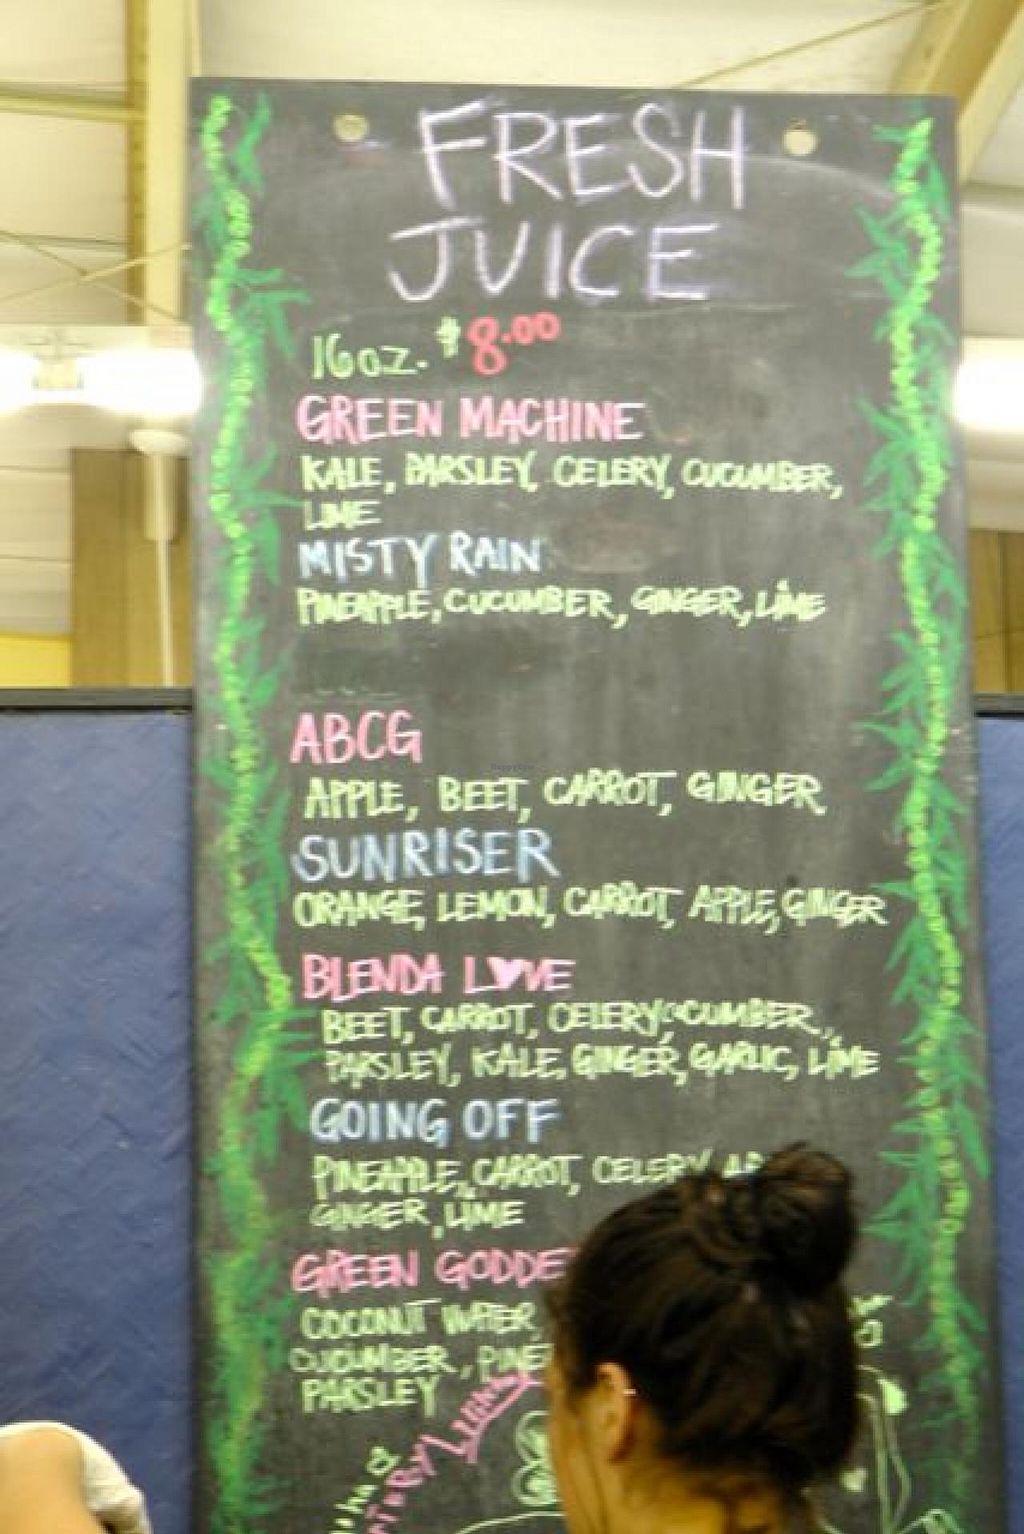 "Photo of Aloha 'Aina Juice Cafe  by <a href=""/members/profile/trinitybourne"">trinitybourne</a> <br/>Nice choice of fresh juices <br/> February 14, 2015  - <a href='/contact/abuse/image/35649/92999'>Report</a>"